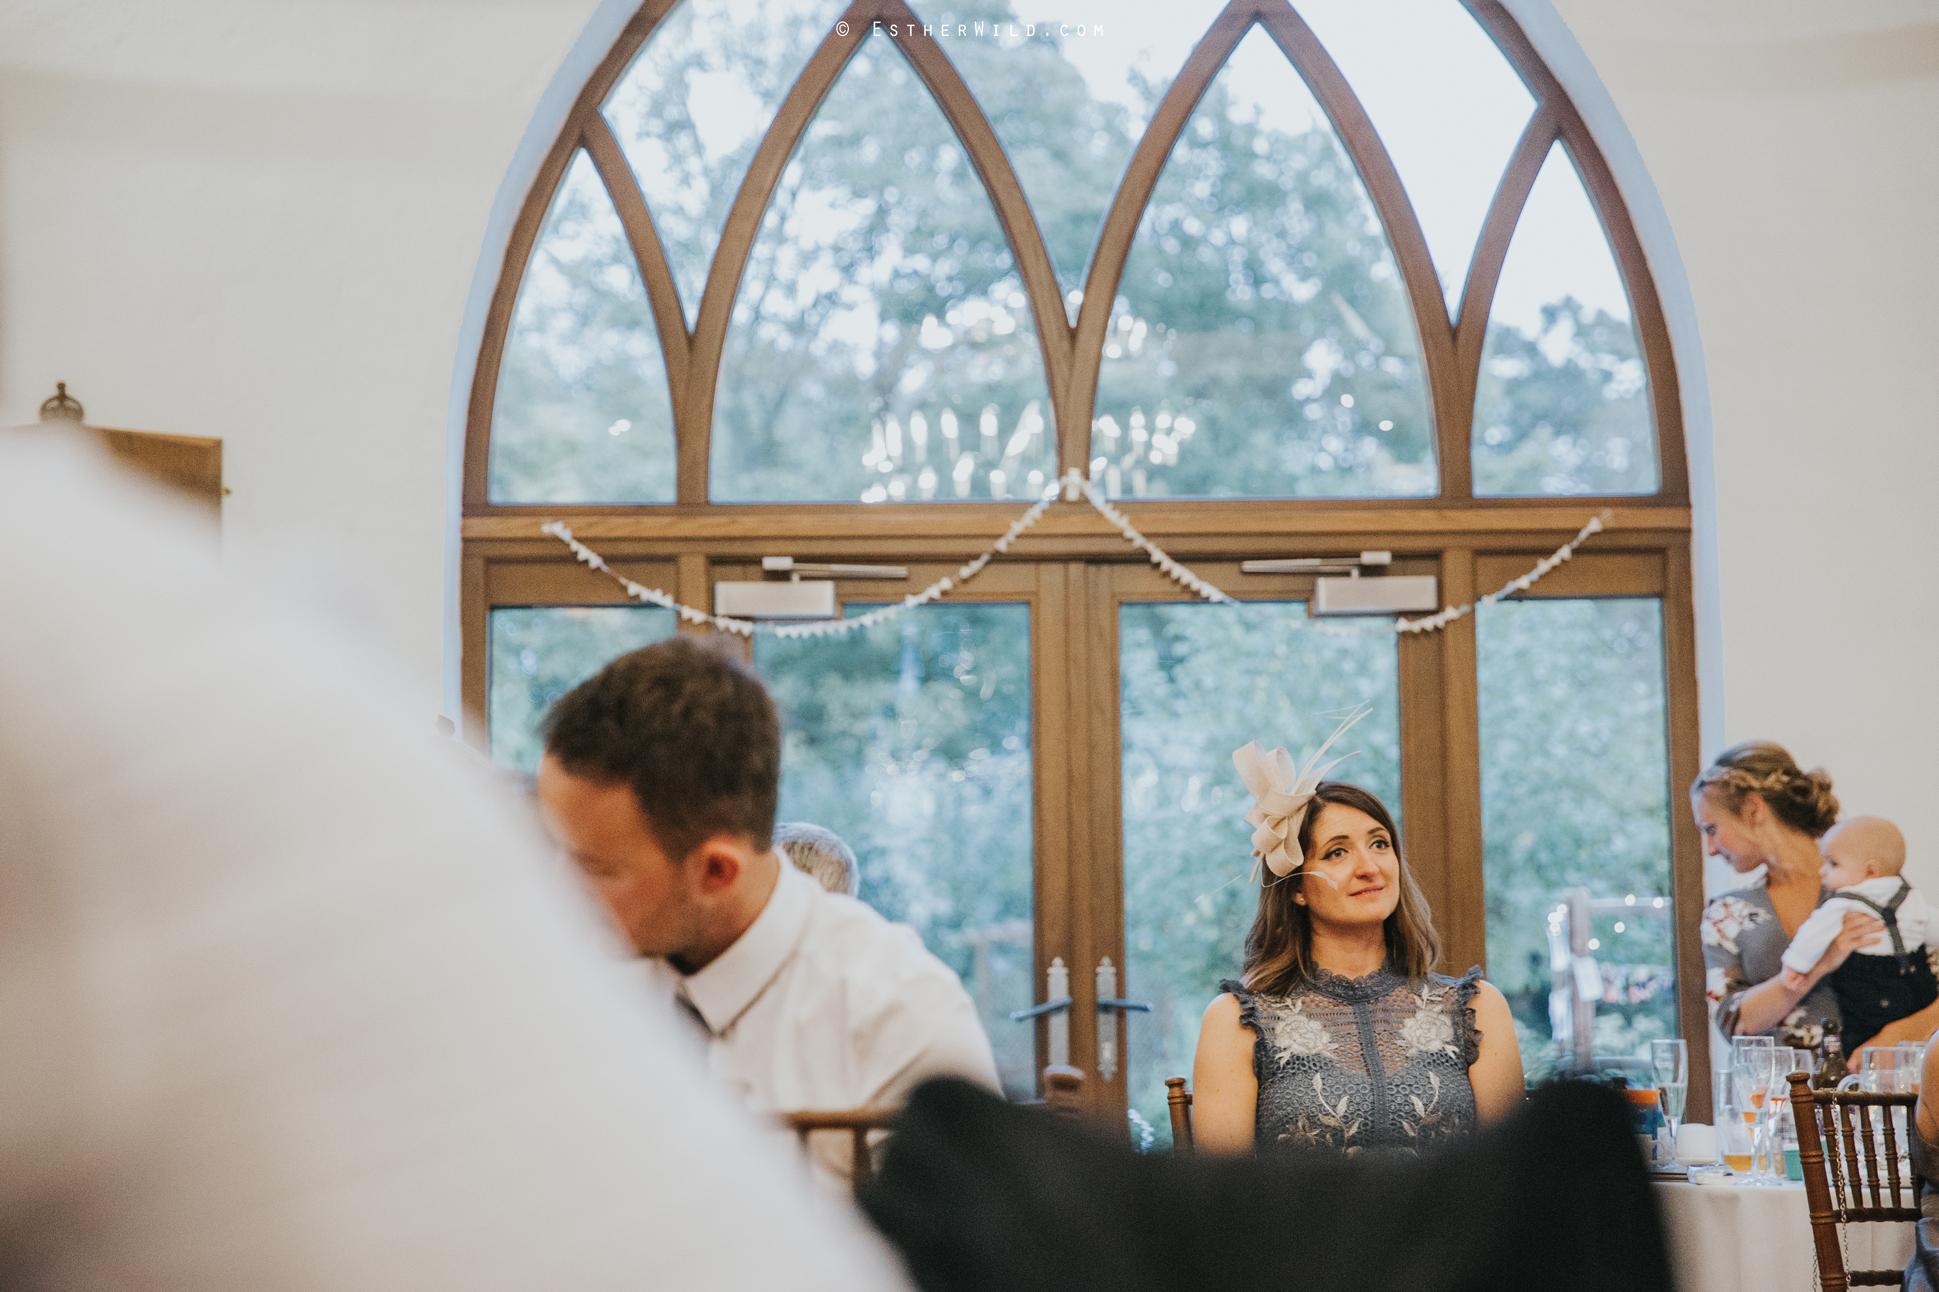 Reading_Room_Weddings_Alby_Norwich_Photographer_Esther_Wild_IMG_2471.jpg